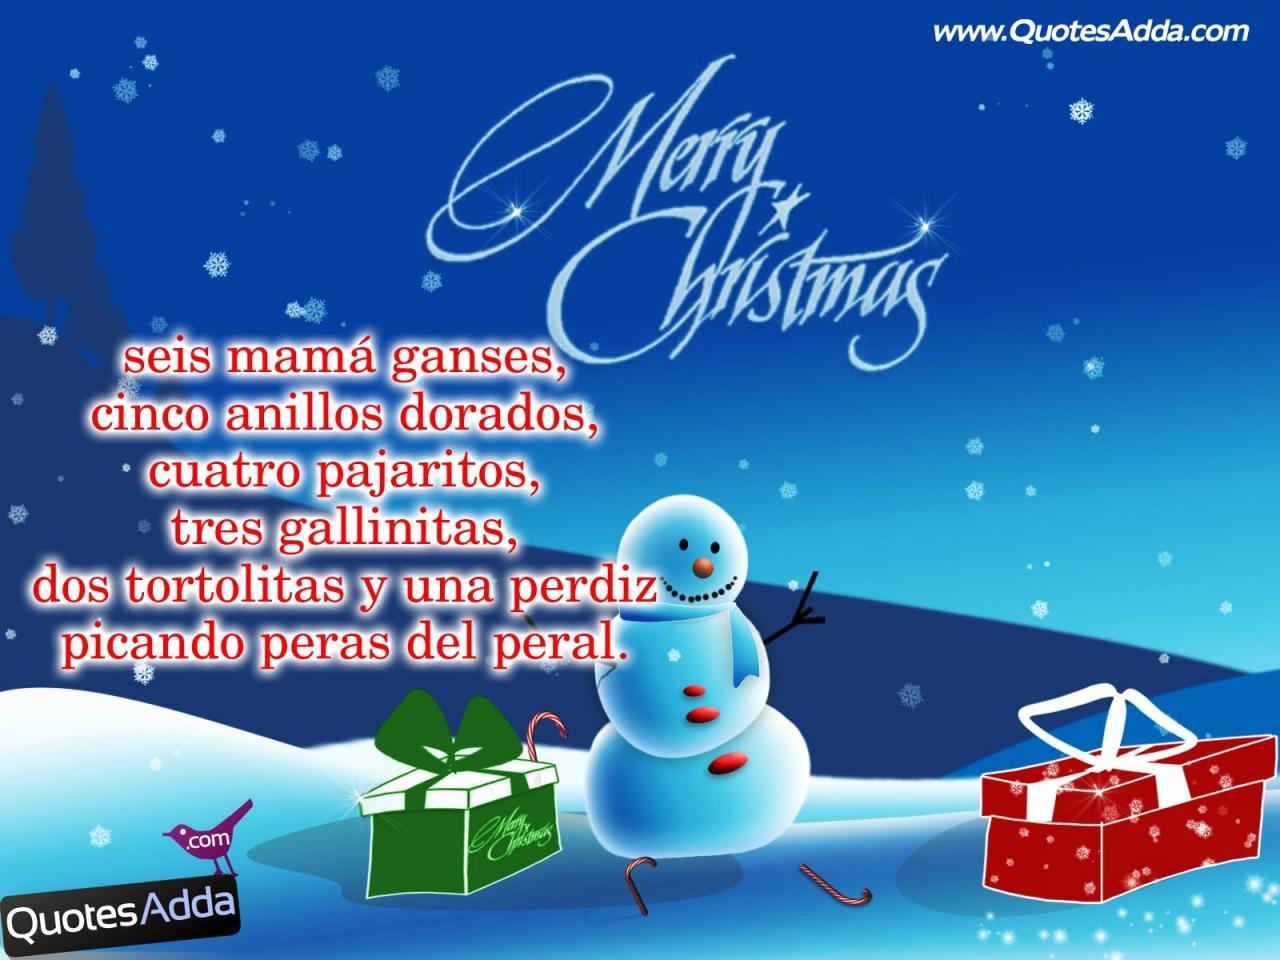 Christmas Quotes In Spanish Quotesadda Com Quotes Tamil Quotes Hindi